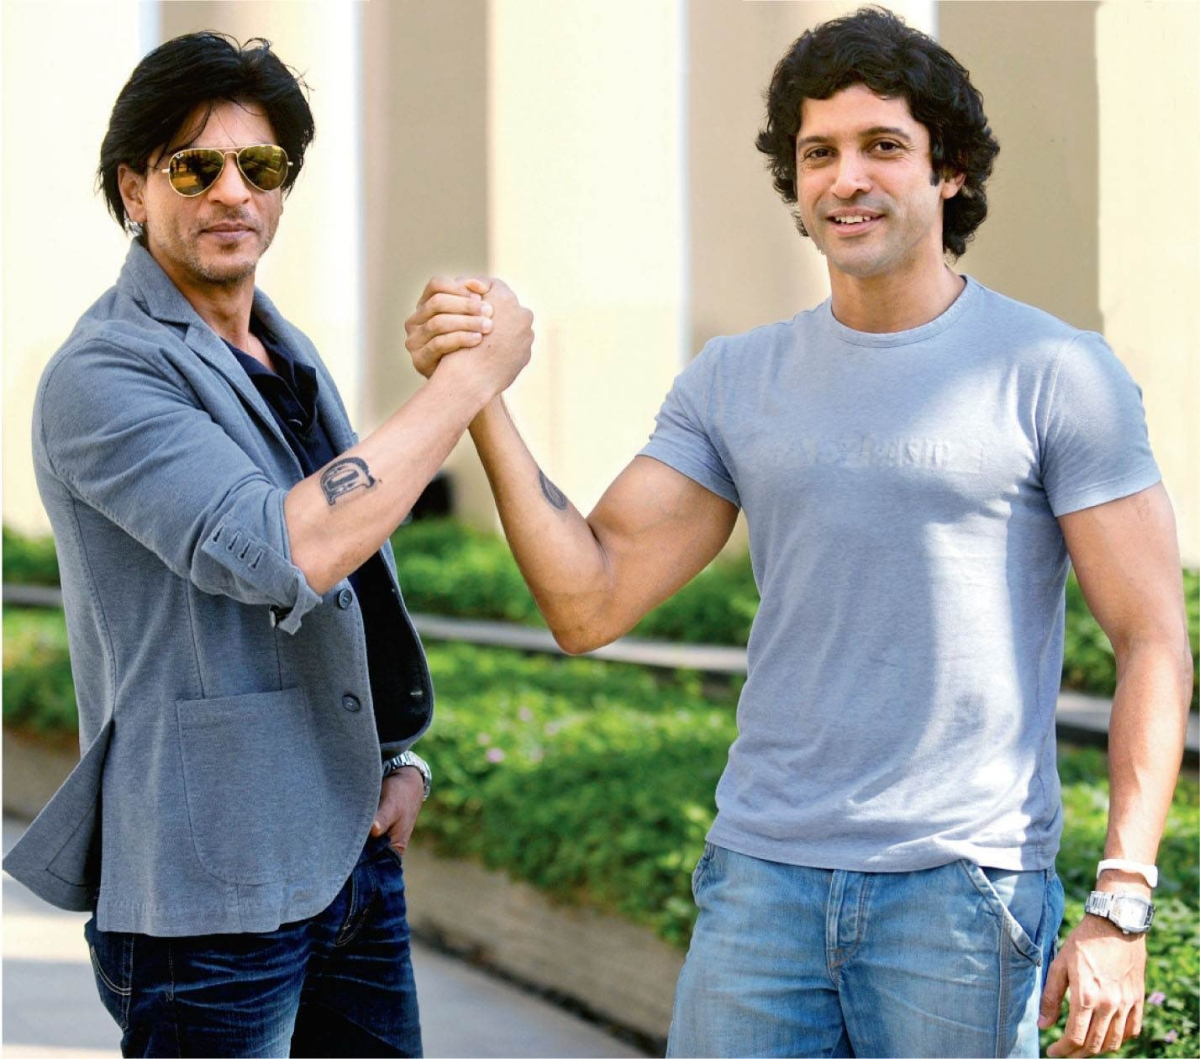 As Farhan Akhtar celebrates 9 years of 'Don 2', Shah Rukh Khan fans demand 'Don 3'